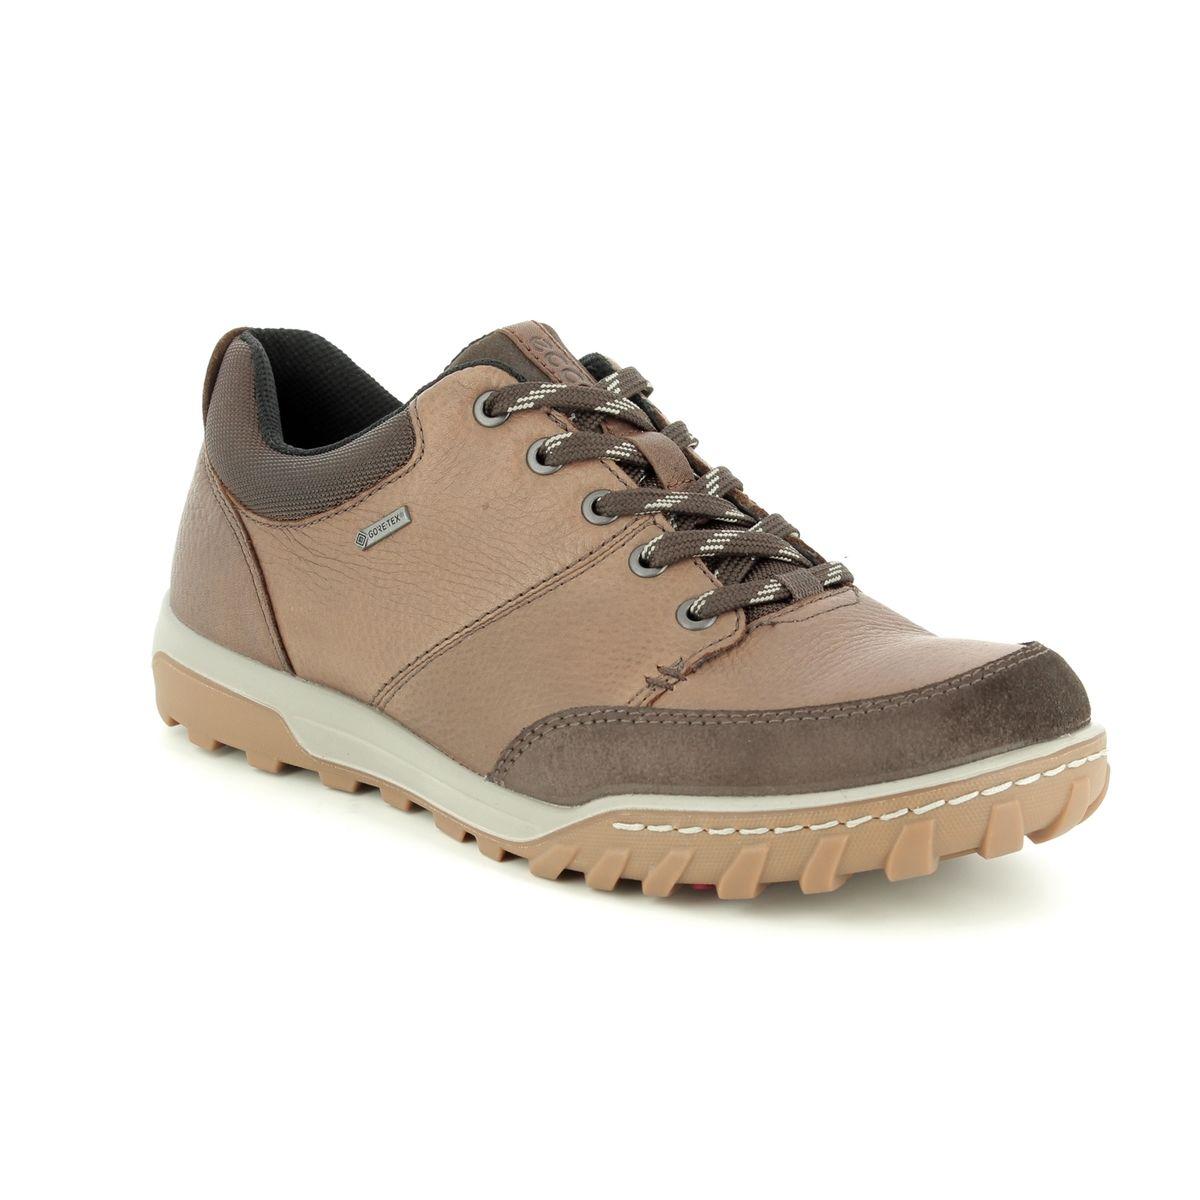 ECCO Casual Shoes - Brown nubuck - 830704 57008 URBAN LIFESTYLE GORE-TEX 5111311c86e